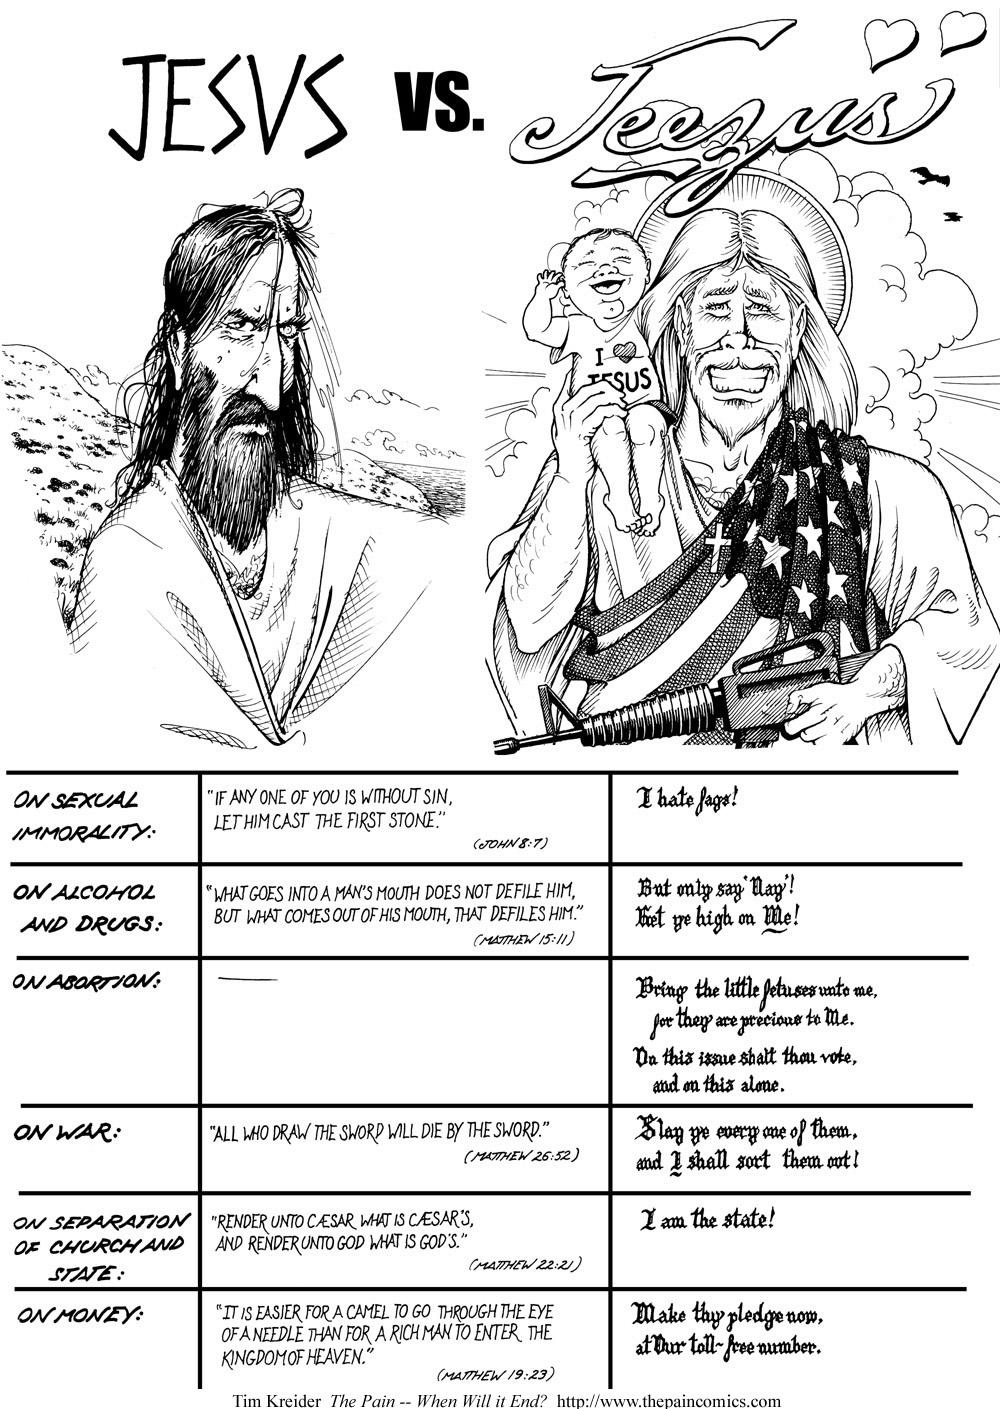 [Image: jesus-vs-jeezus.jpg]